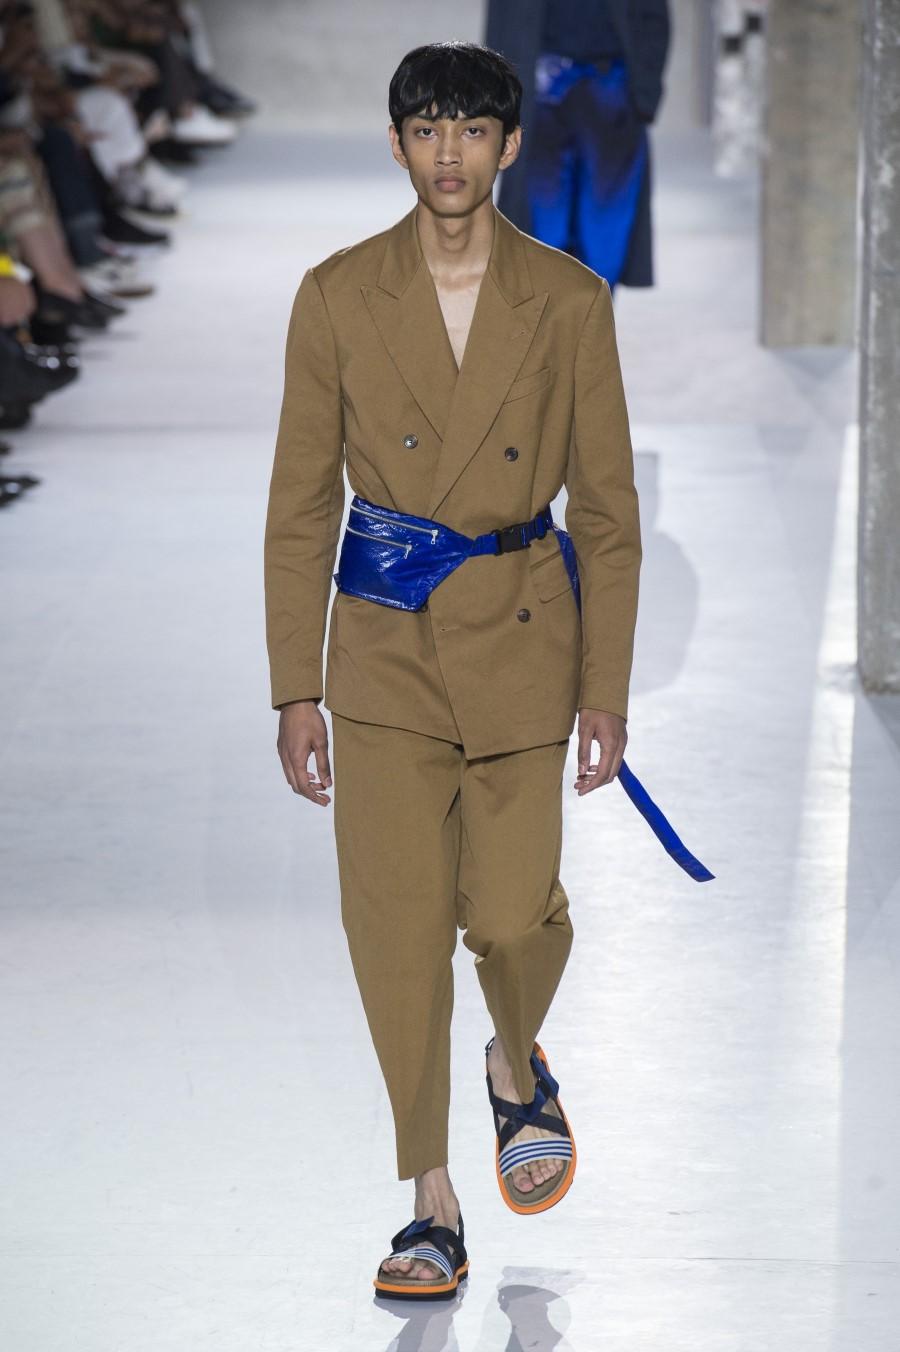 Dries Van Noten Spring/Summer 2019 - Paris Fashion Week